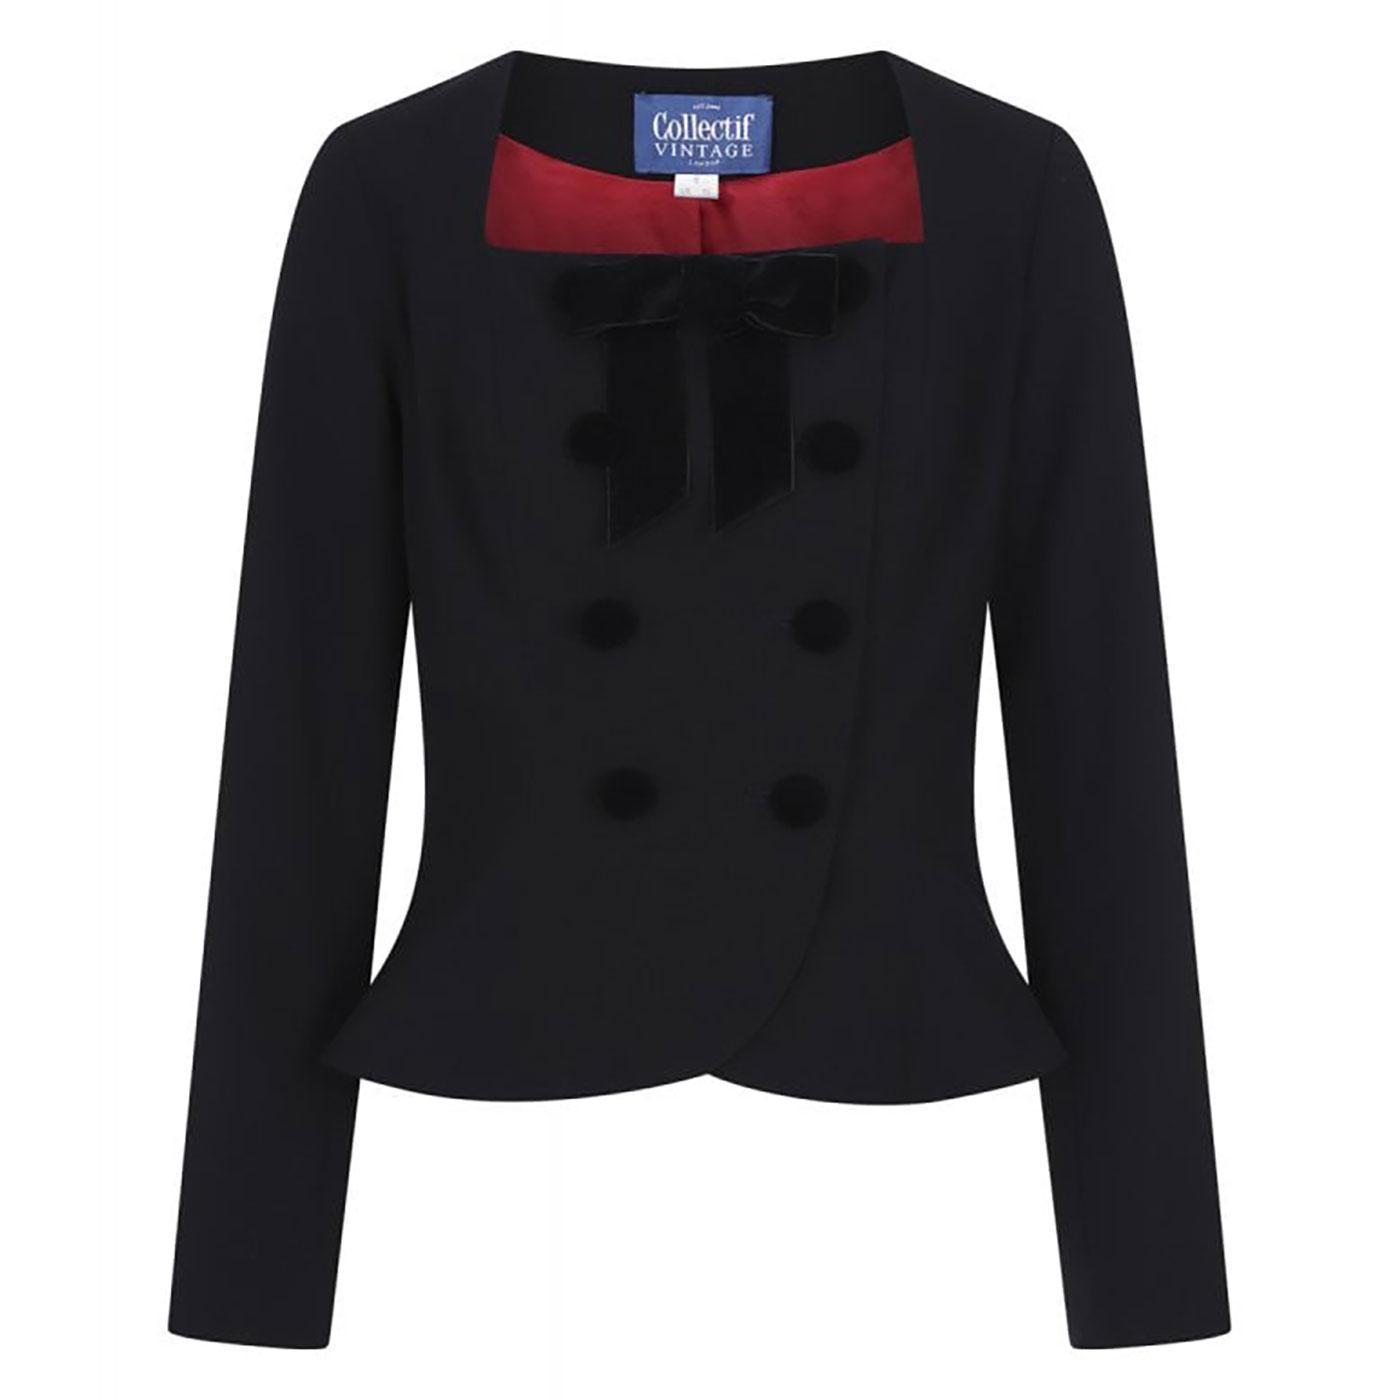 Agatha COLLECTIF Plain Vintage Jacket In Black